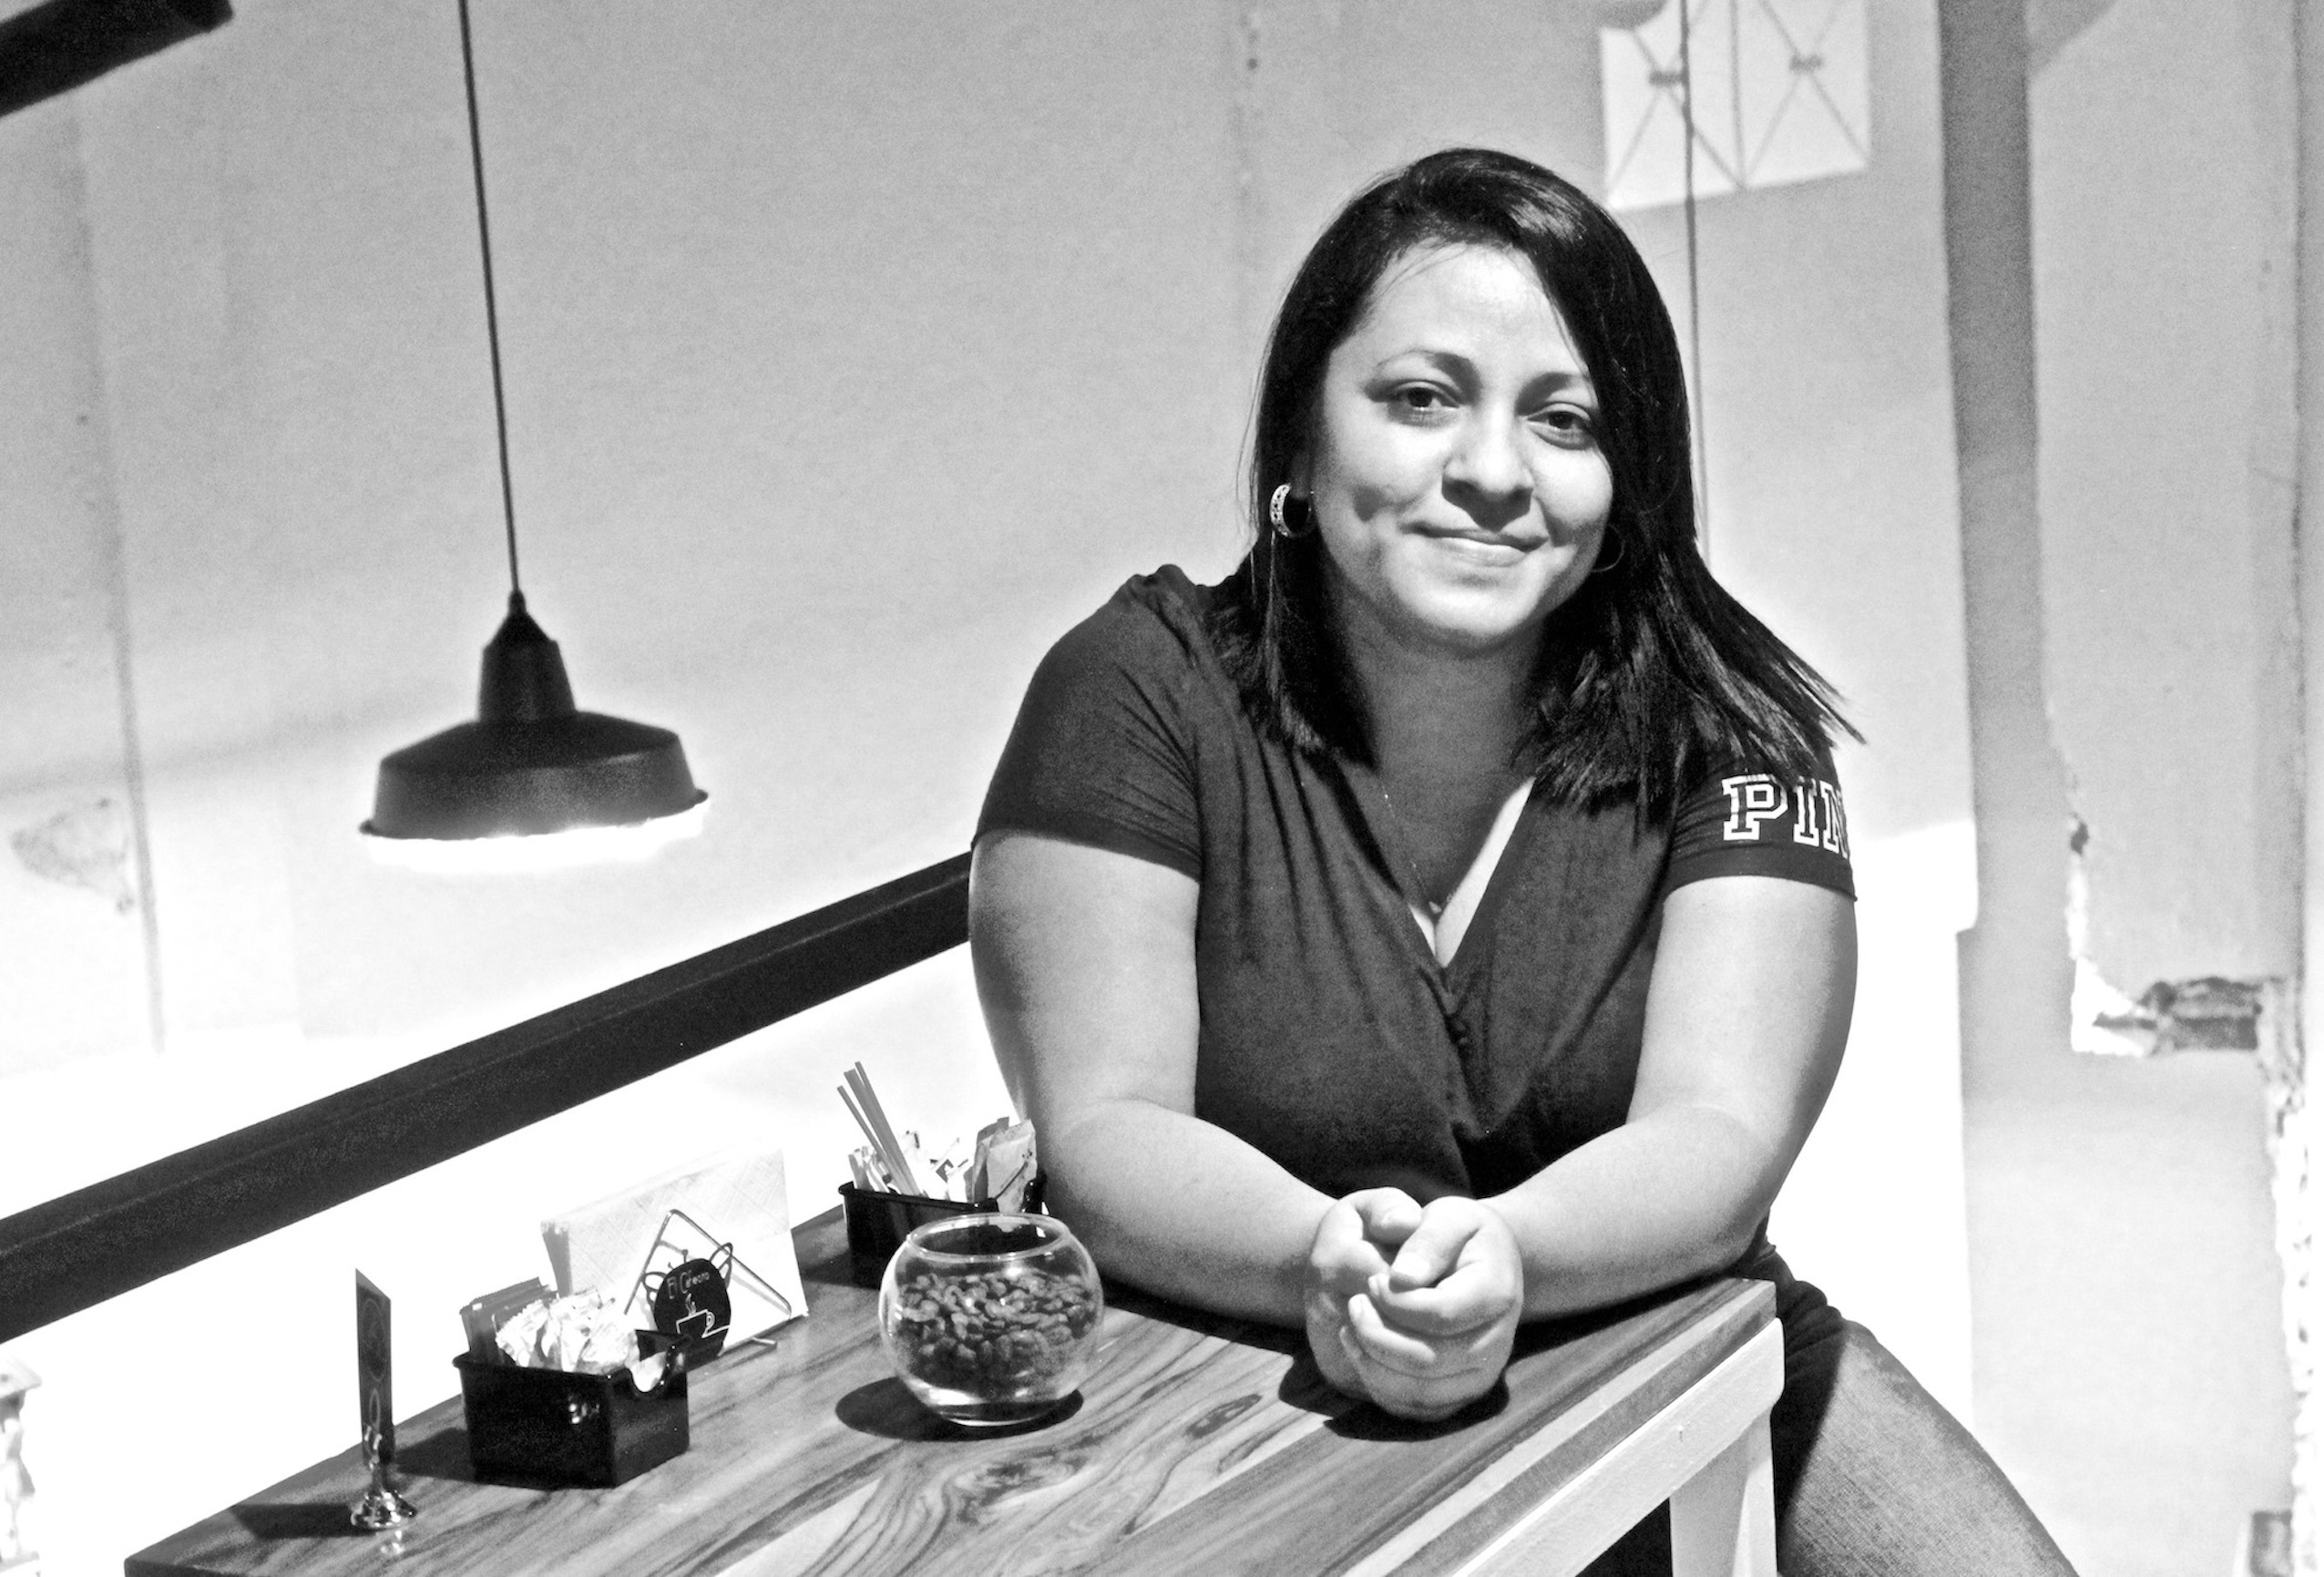 Personas Hondureñas: Meet Jeimy Santelli, Lead Teacher Developer forTrain For Change